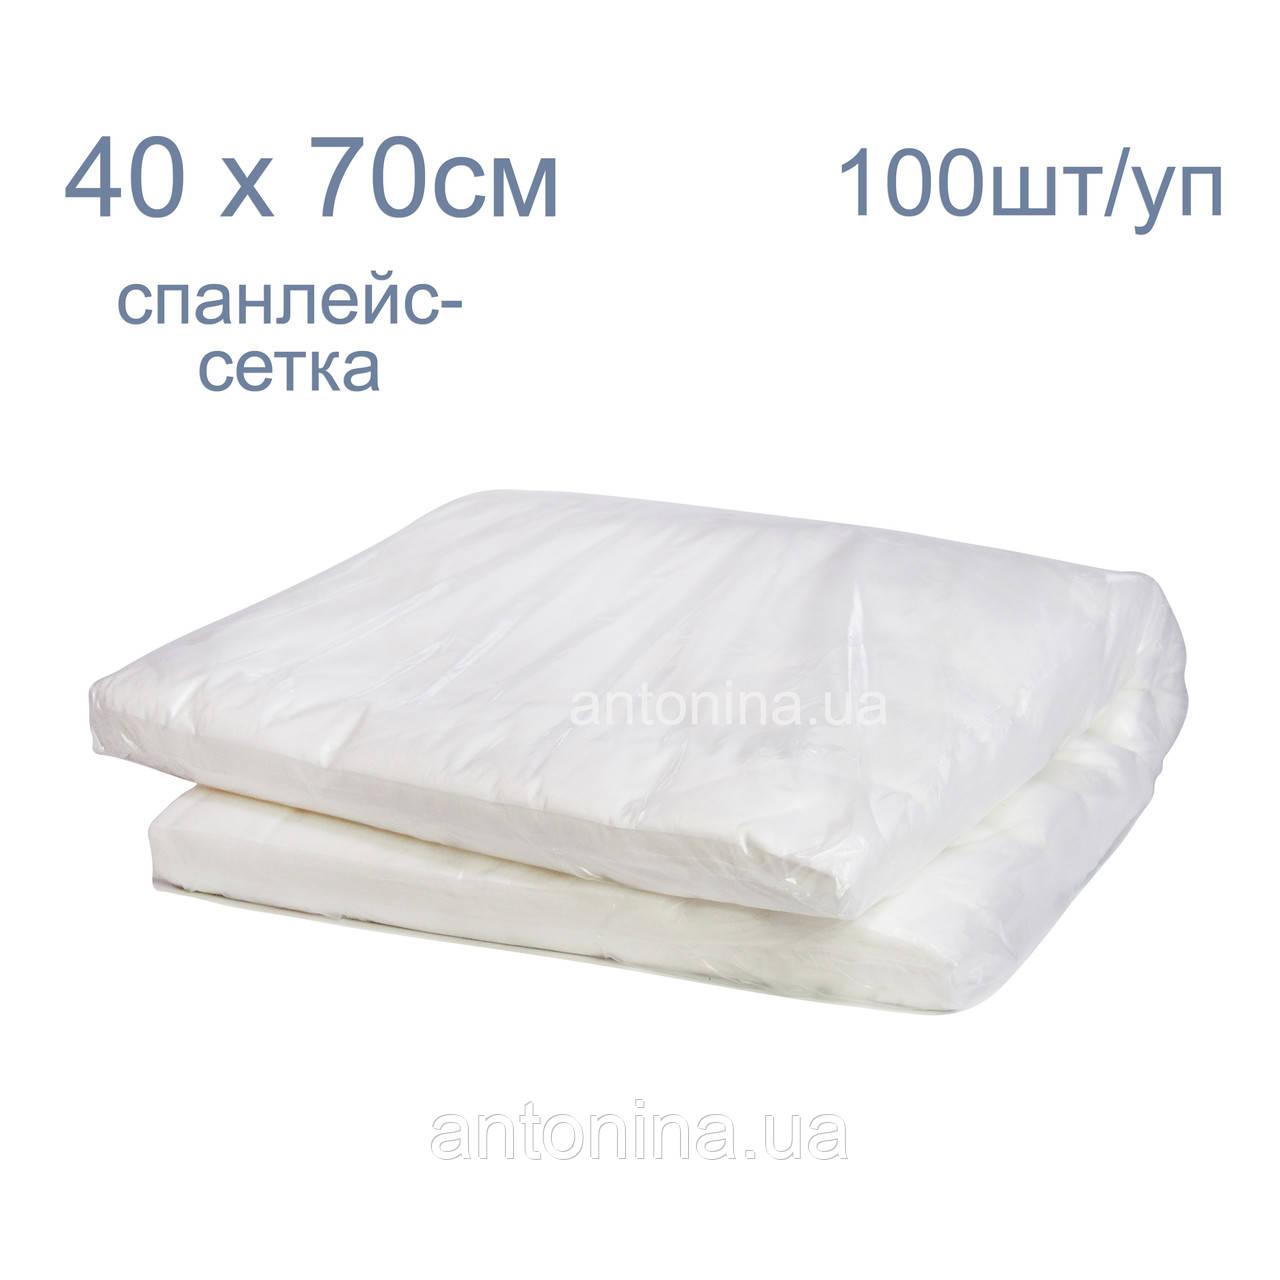 Полотенце 40х70см, сетка-спанлейс (пл.40), 100 шт/уп